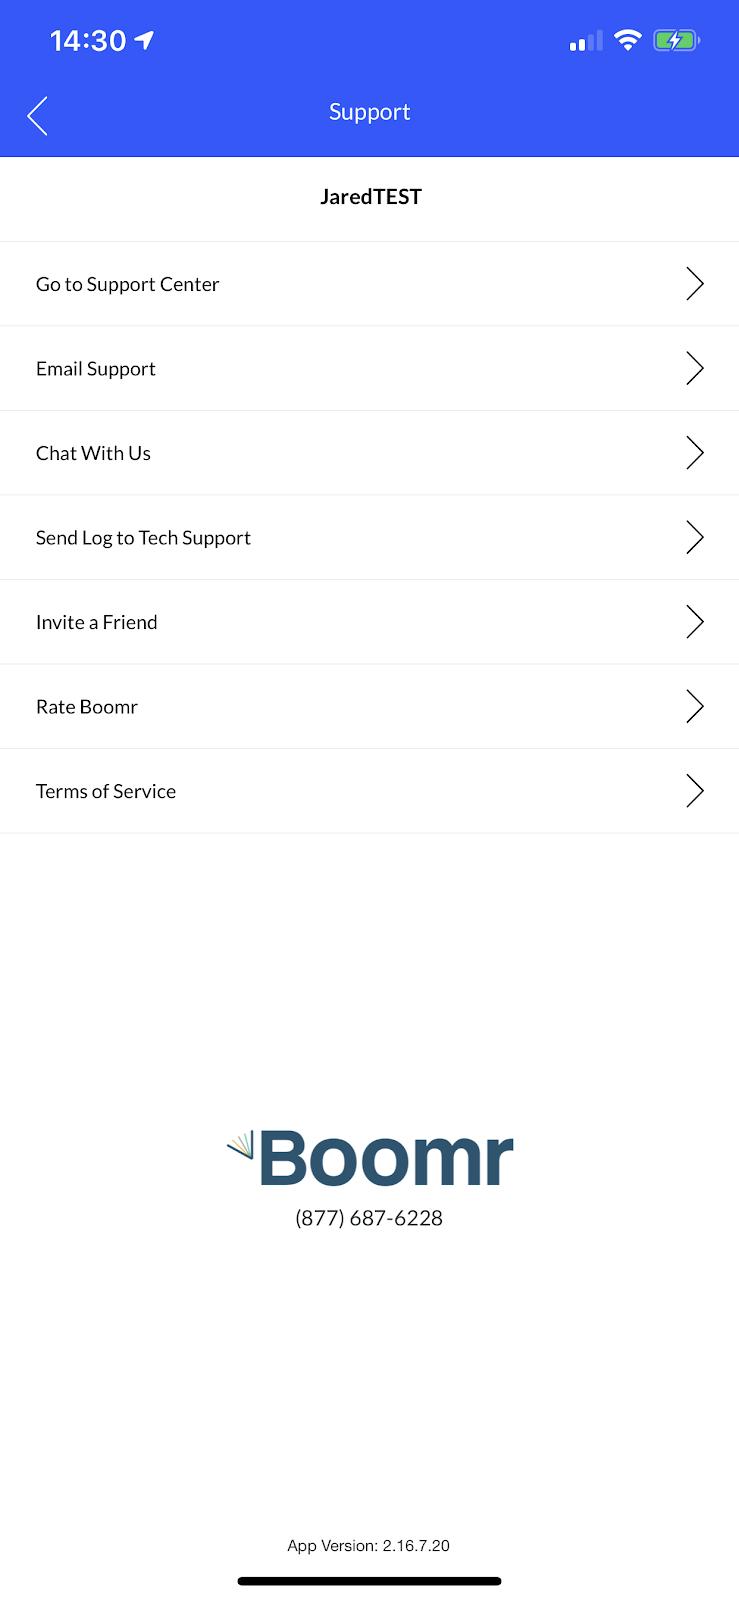 Screenshot showing the 'Support' screen